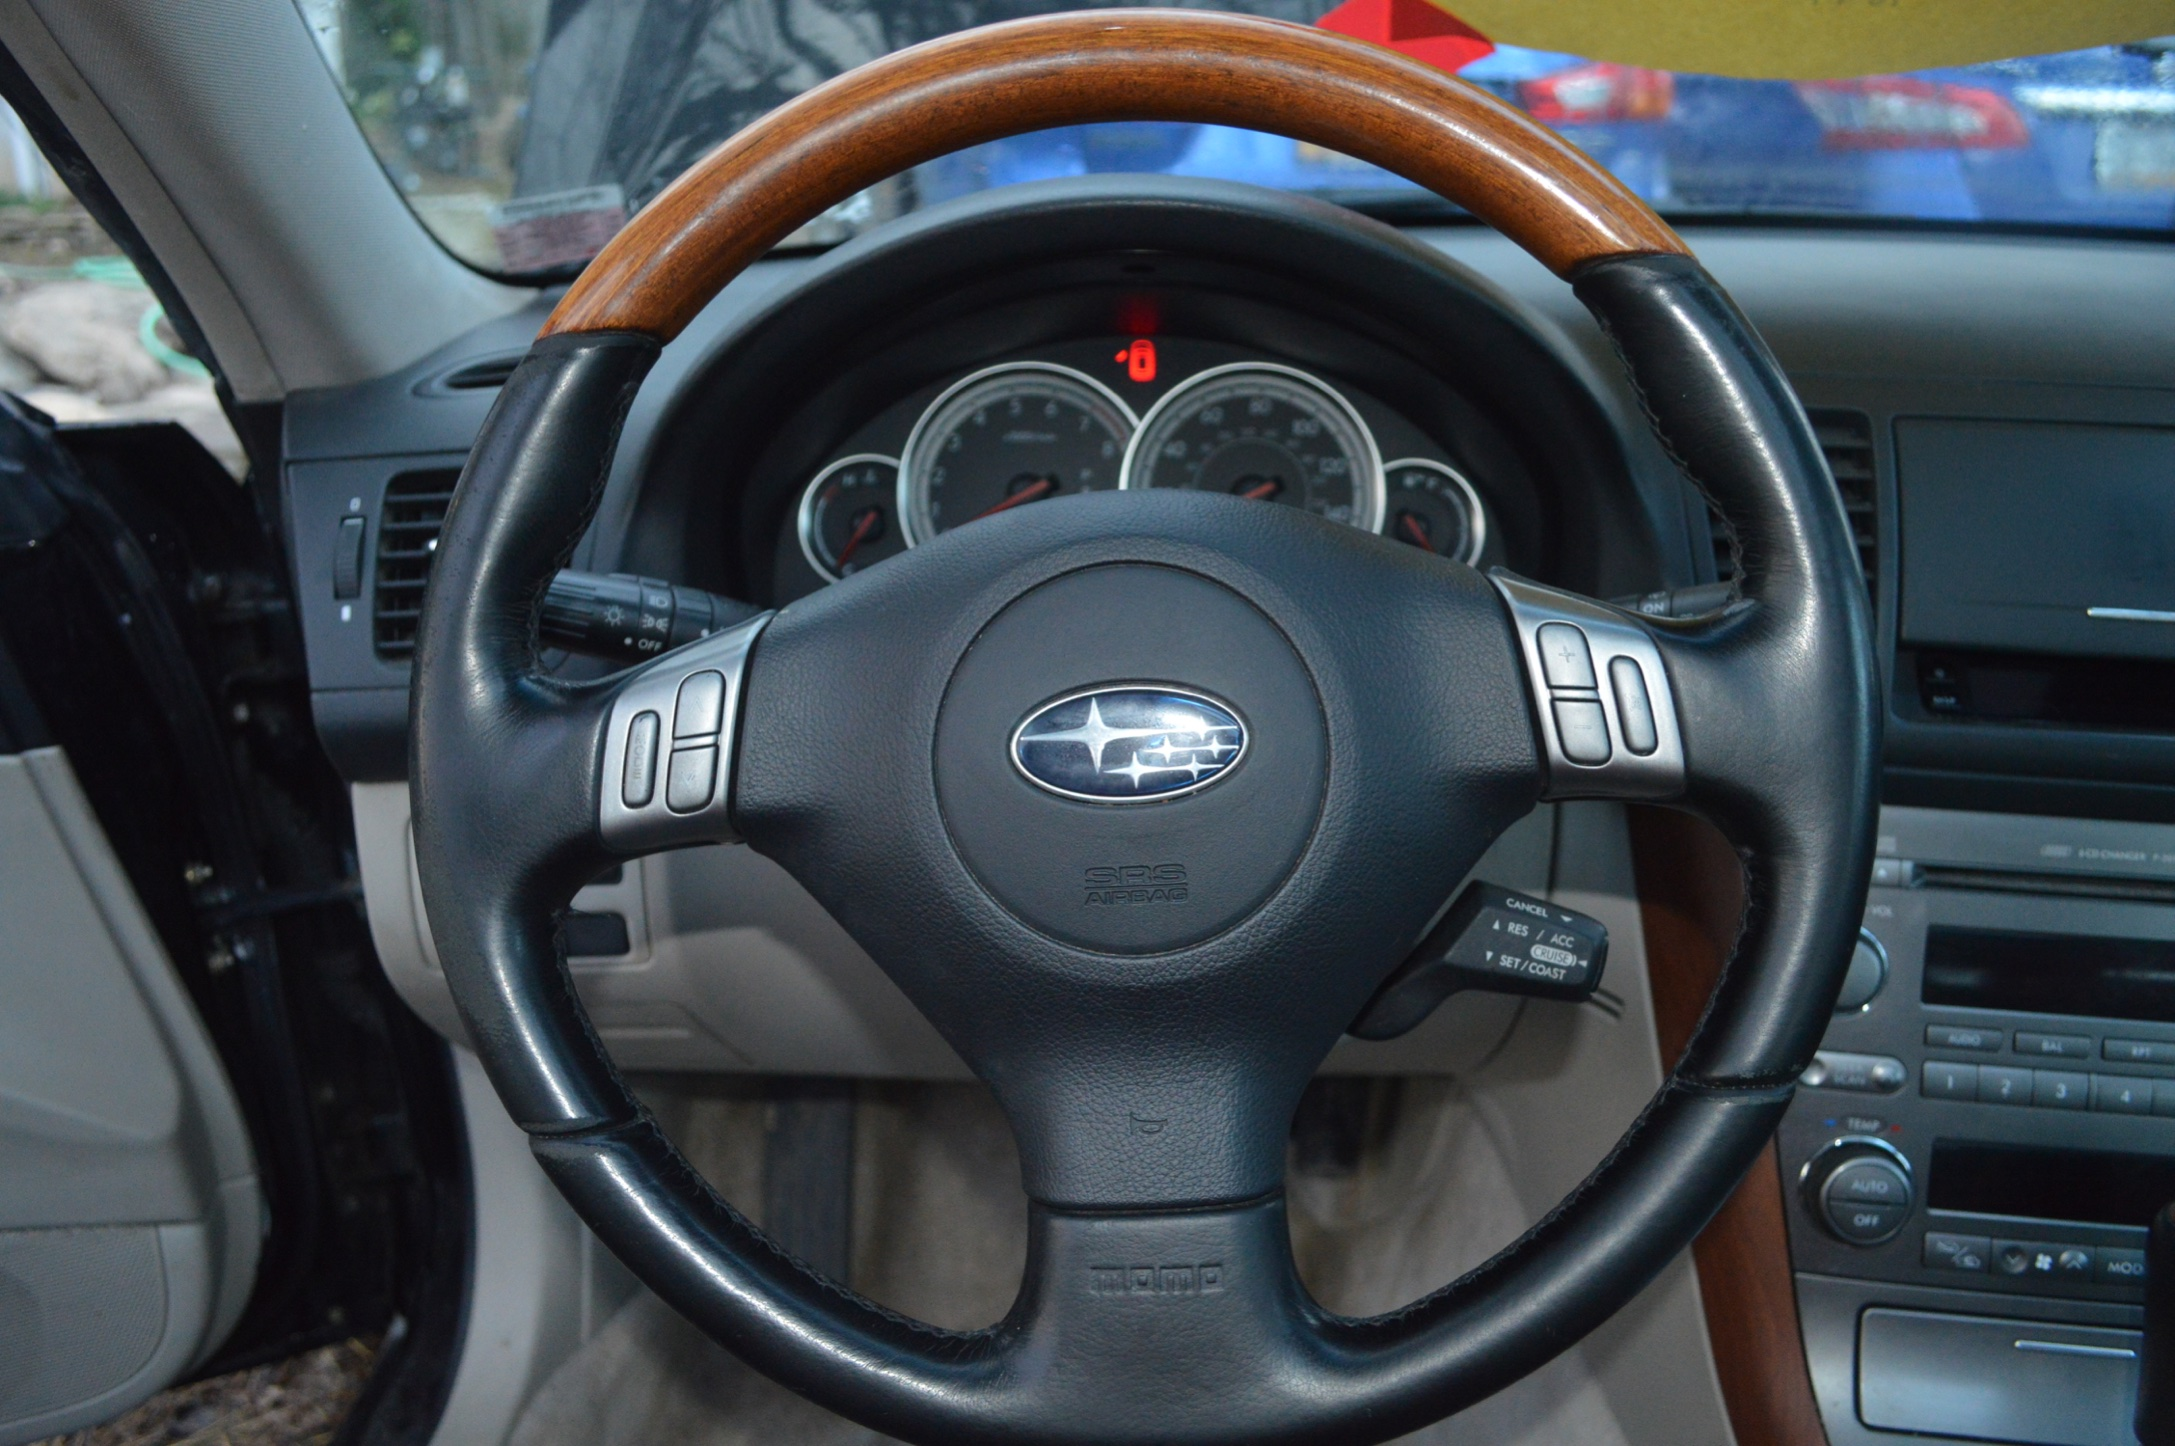 FS: 2005 outback LL bean, $4,000 obo (Oswego,NY) - Subaru ...